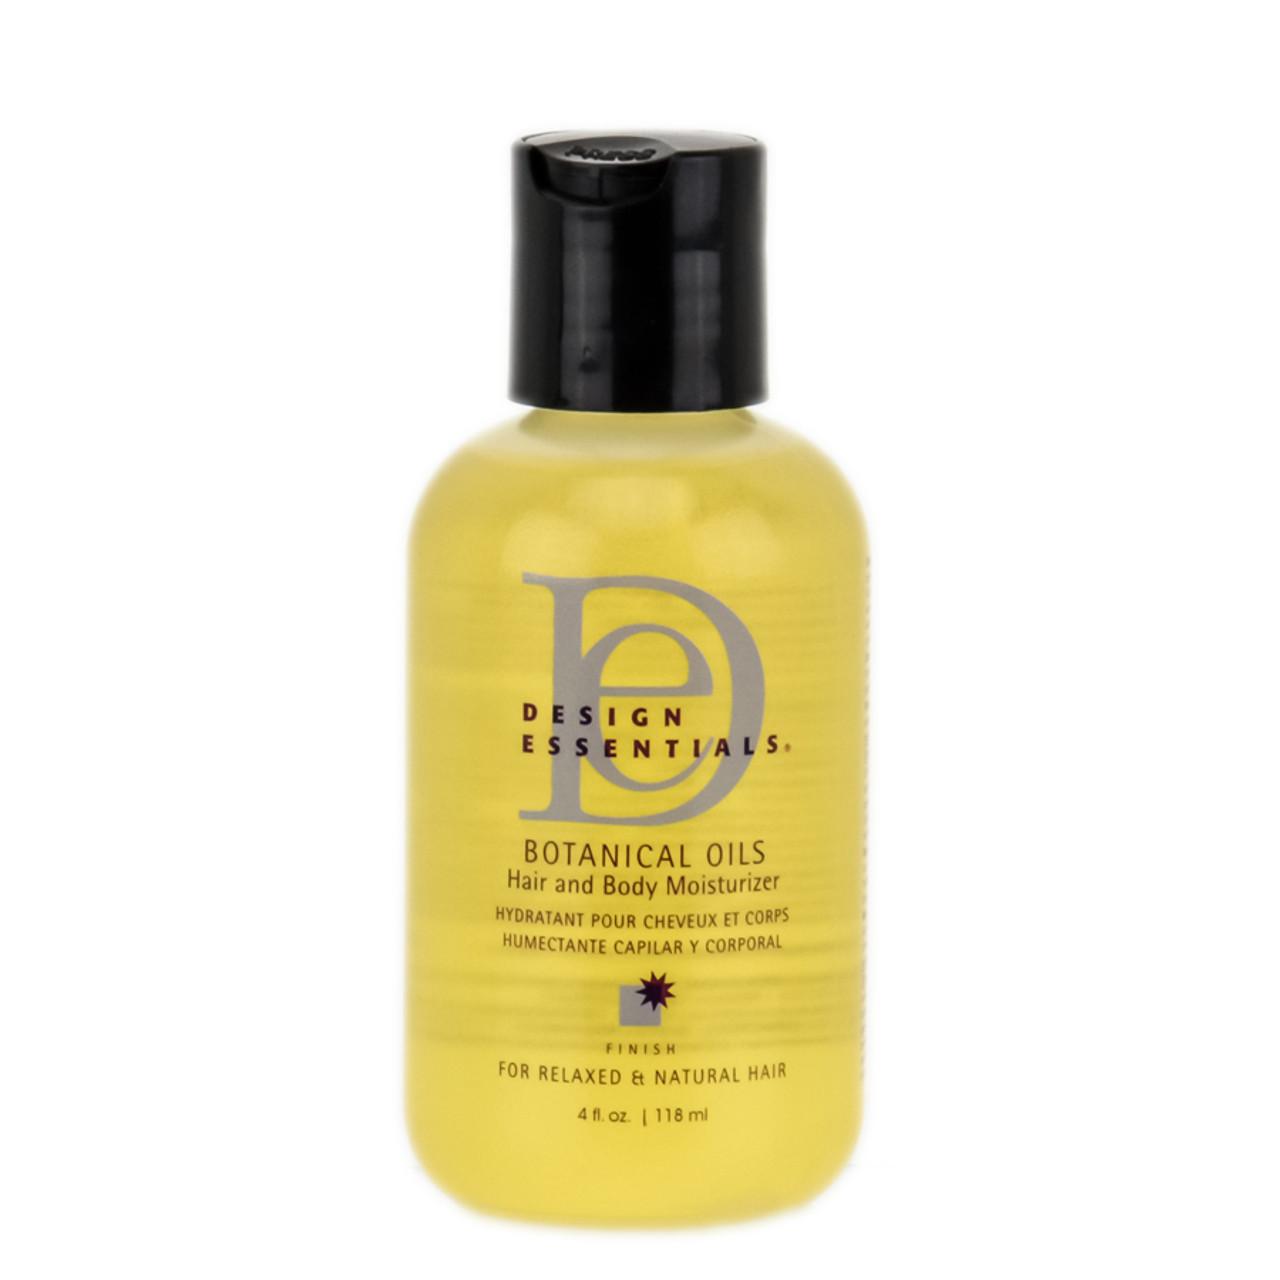 design essentials botanical oils